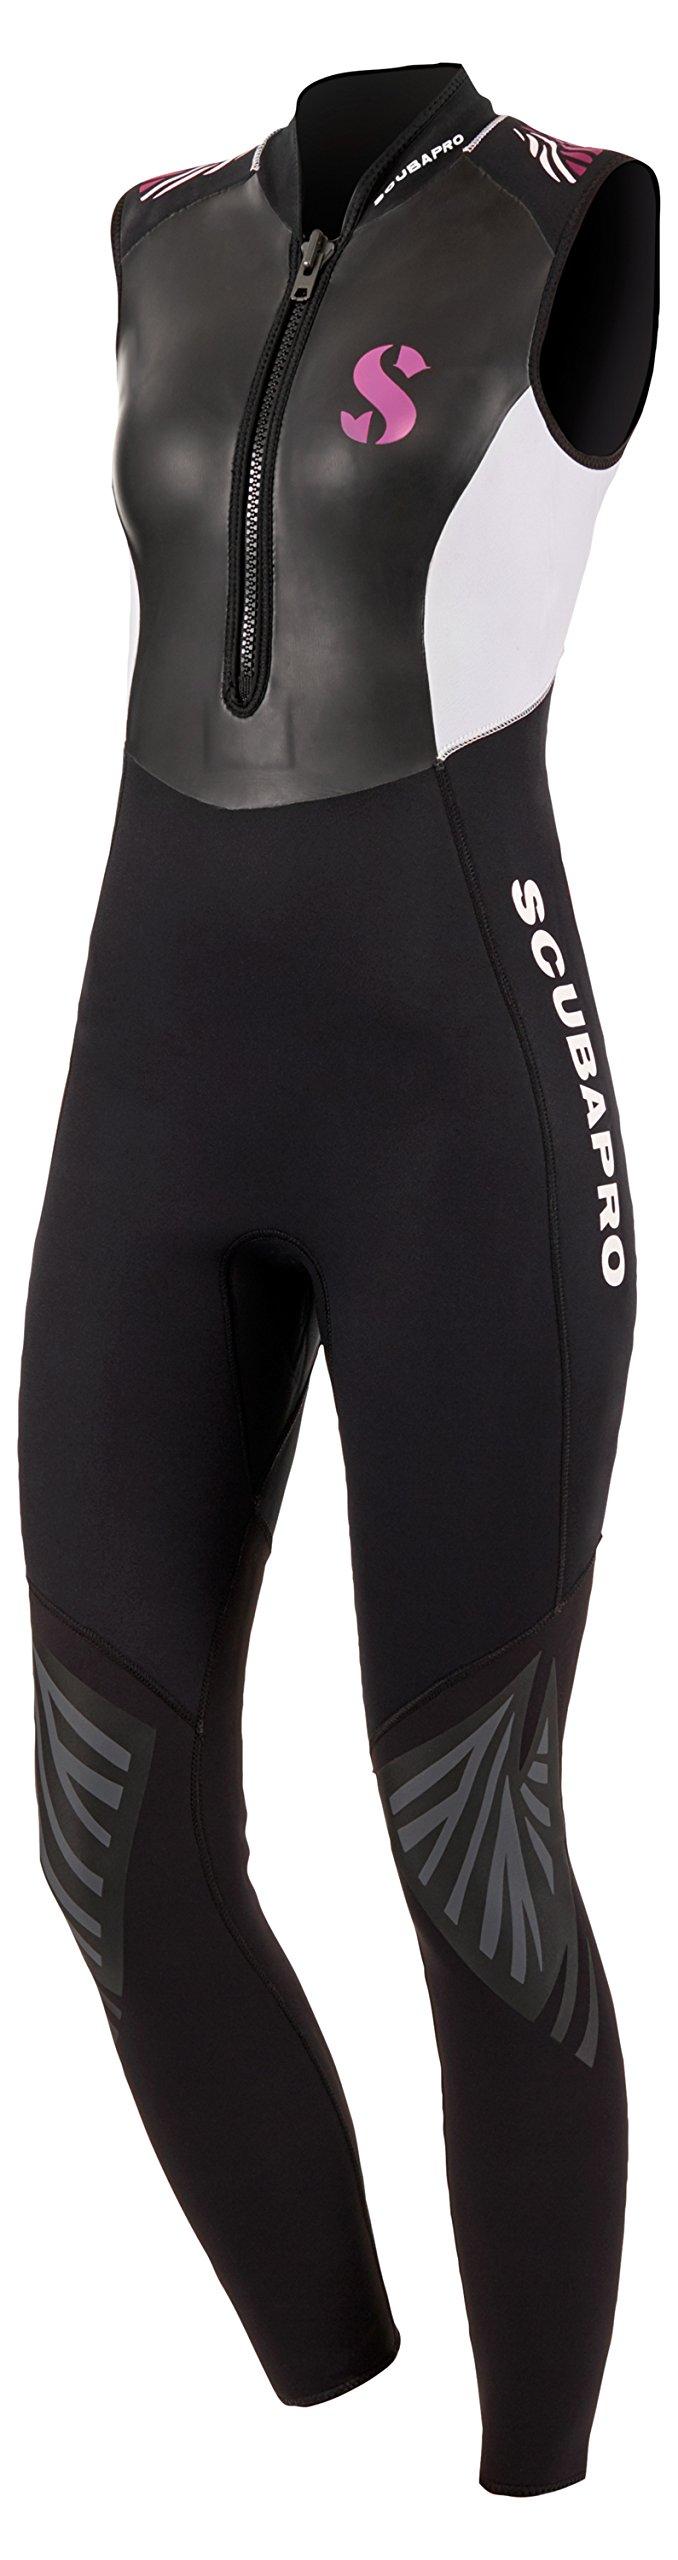 Scubapro Hybrid Steamer Front Zip 3mm Womens Sleeveless Wetsuit - Black/White - Medium